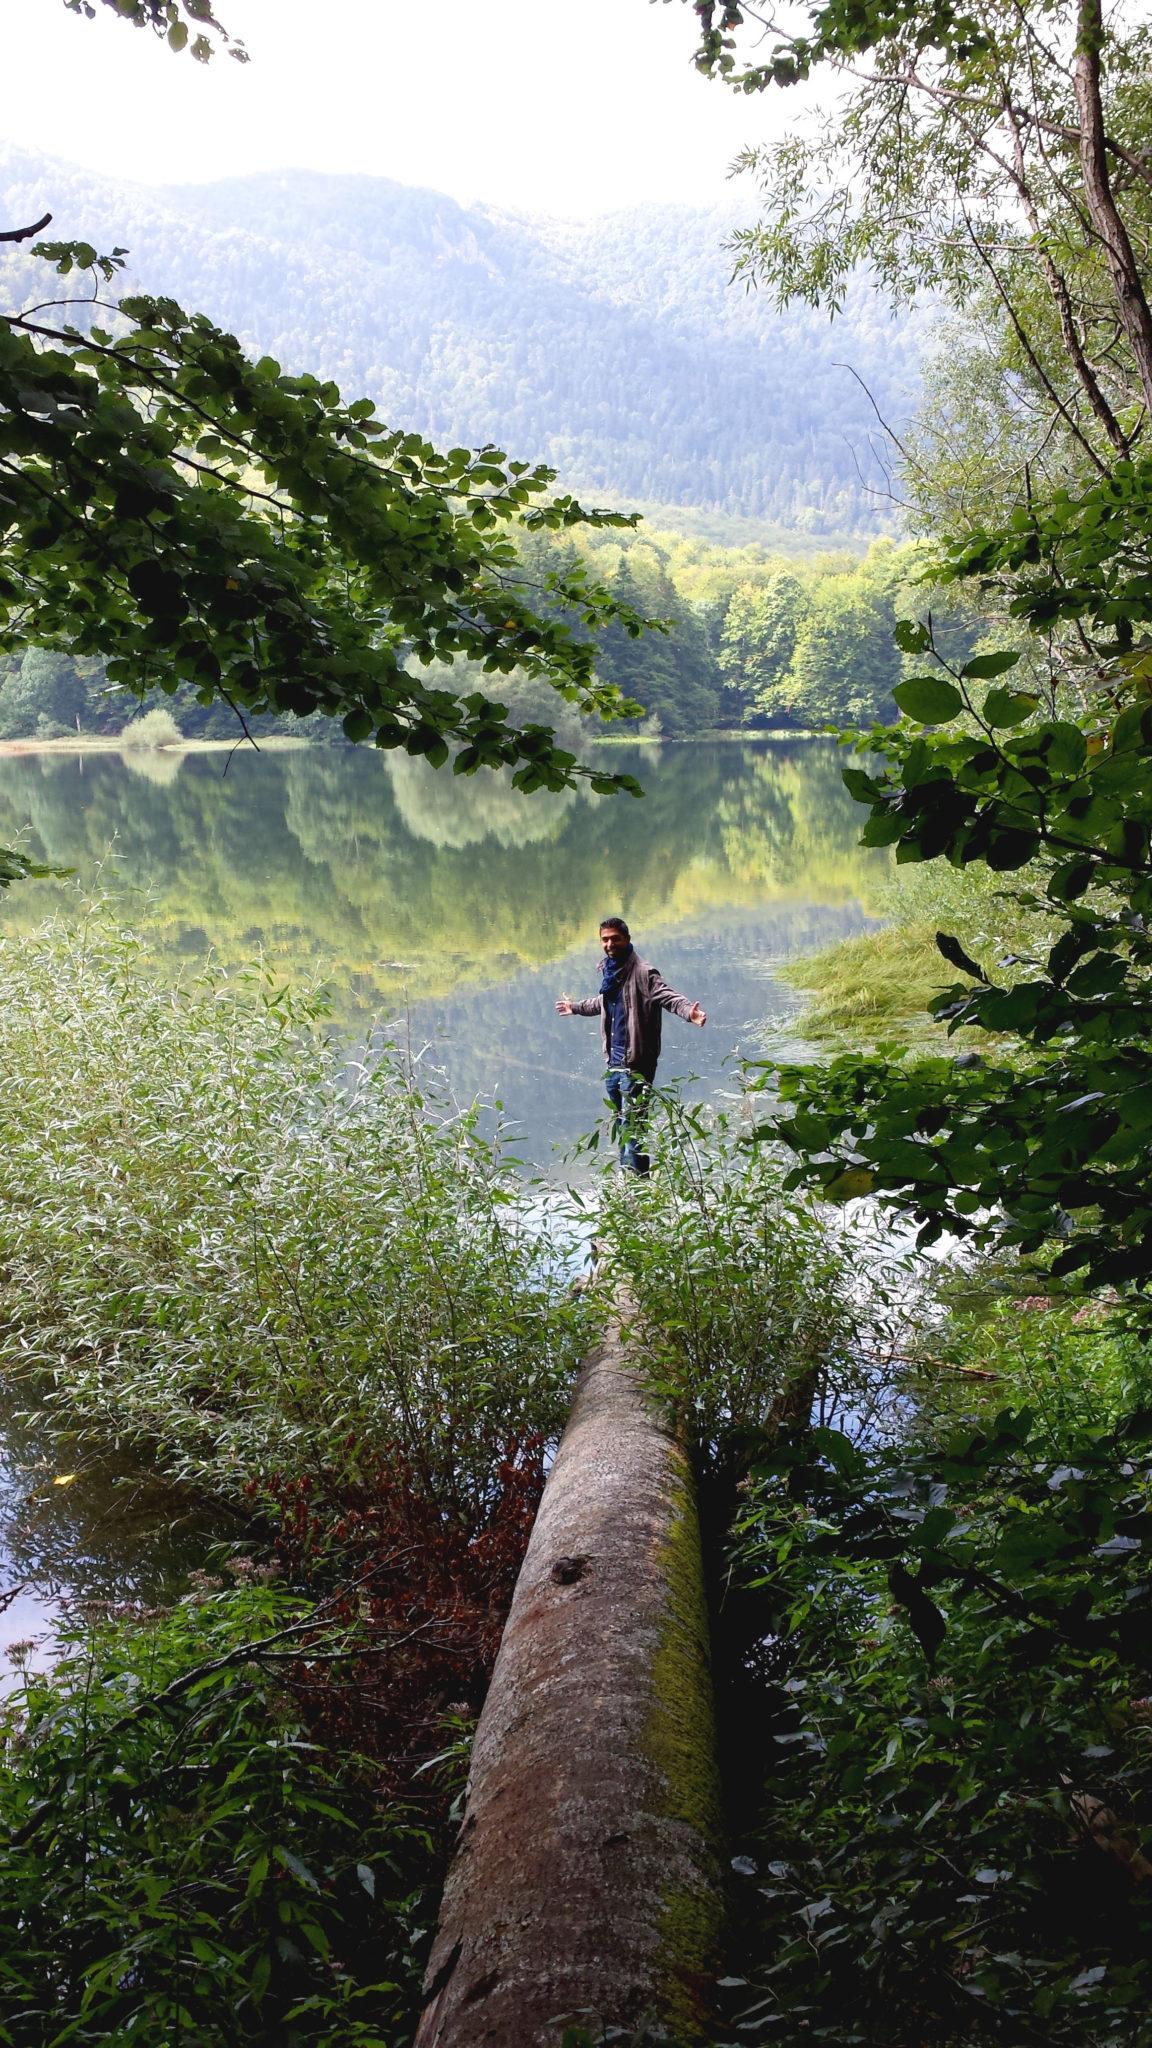 Hema_Montenegro_parc_national_biogradska_gora_forest_travel_voyage_blog18